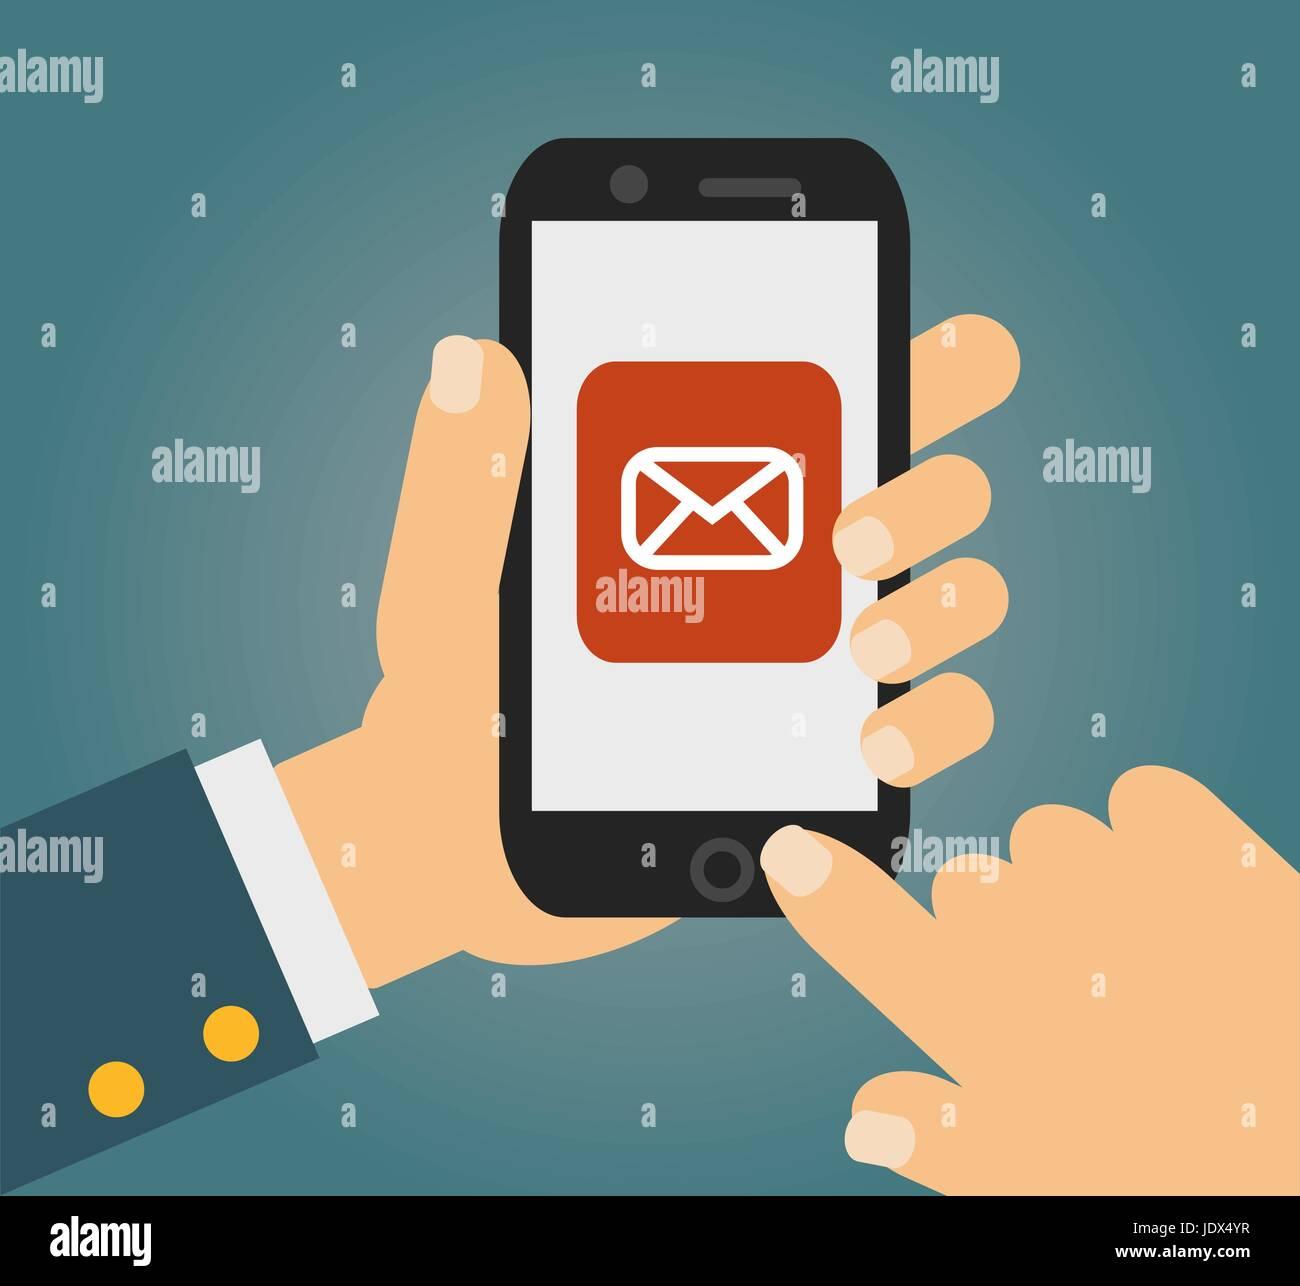 Email Envelope Symbol Phone Stock Photos & Email Envelope Symbol